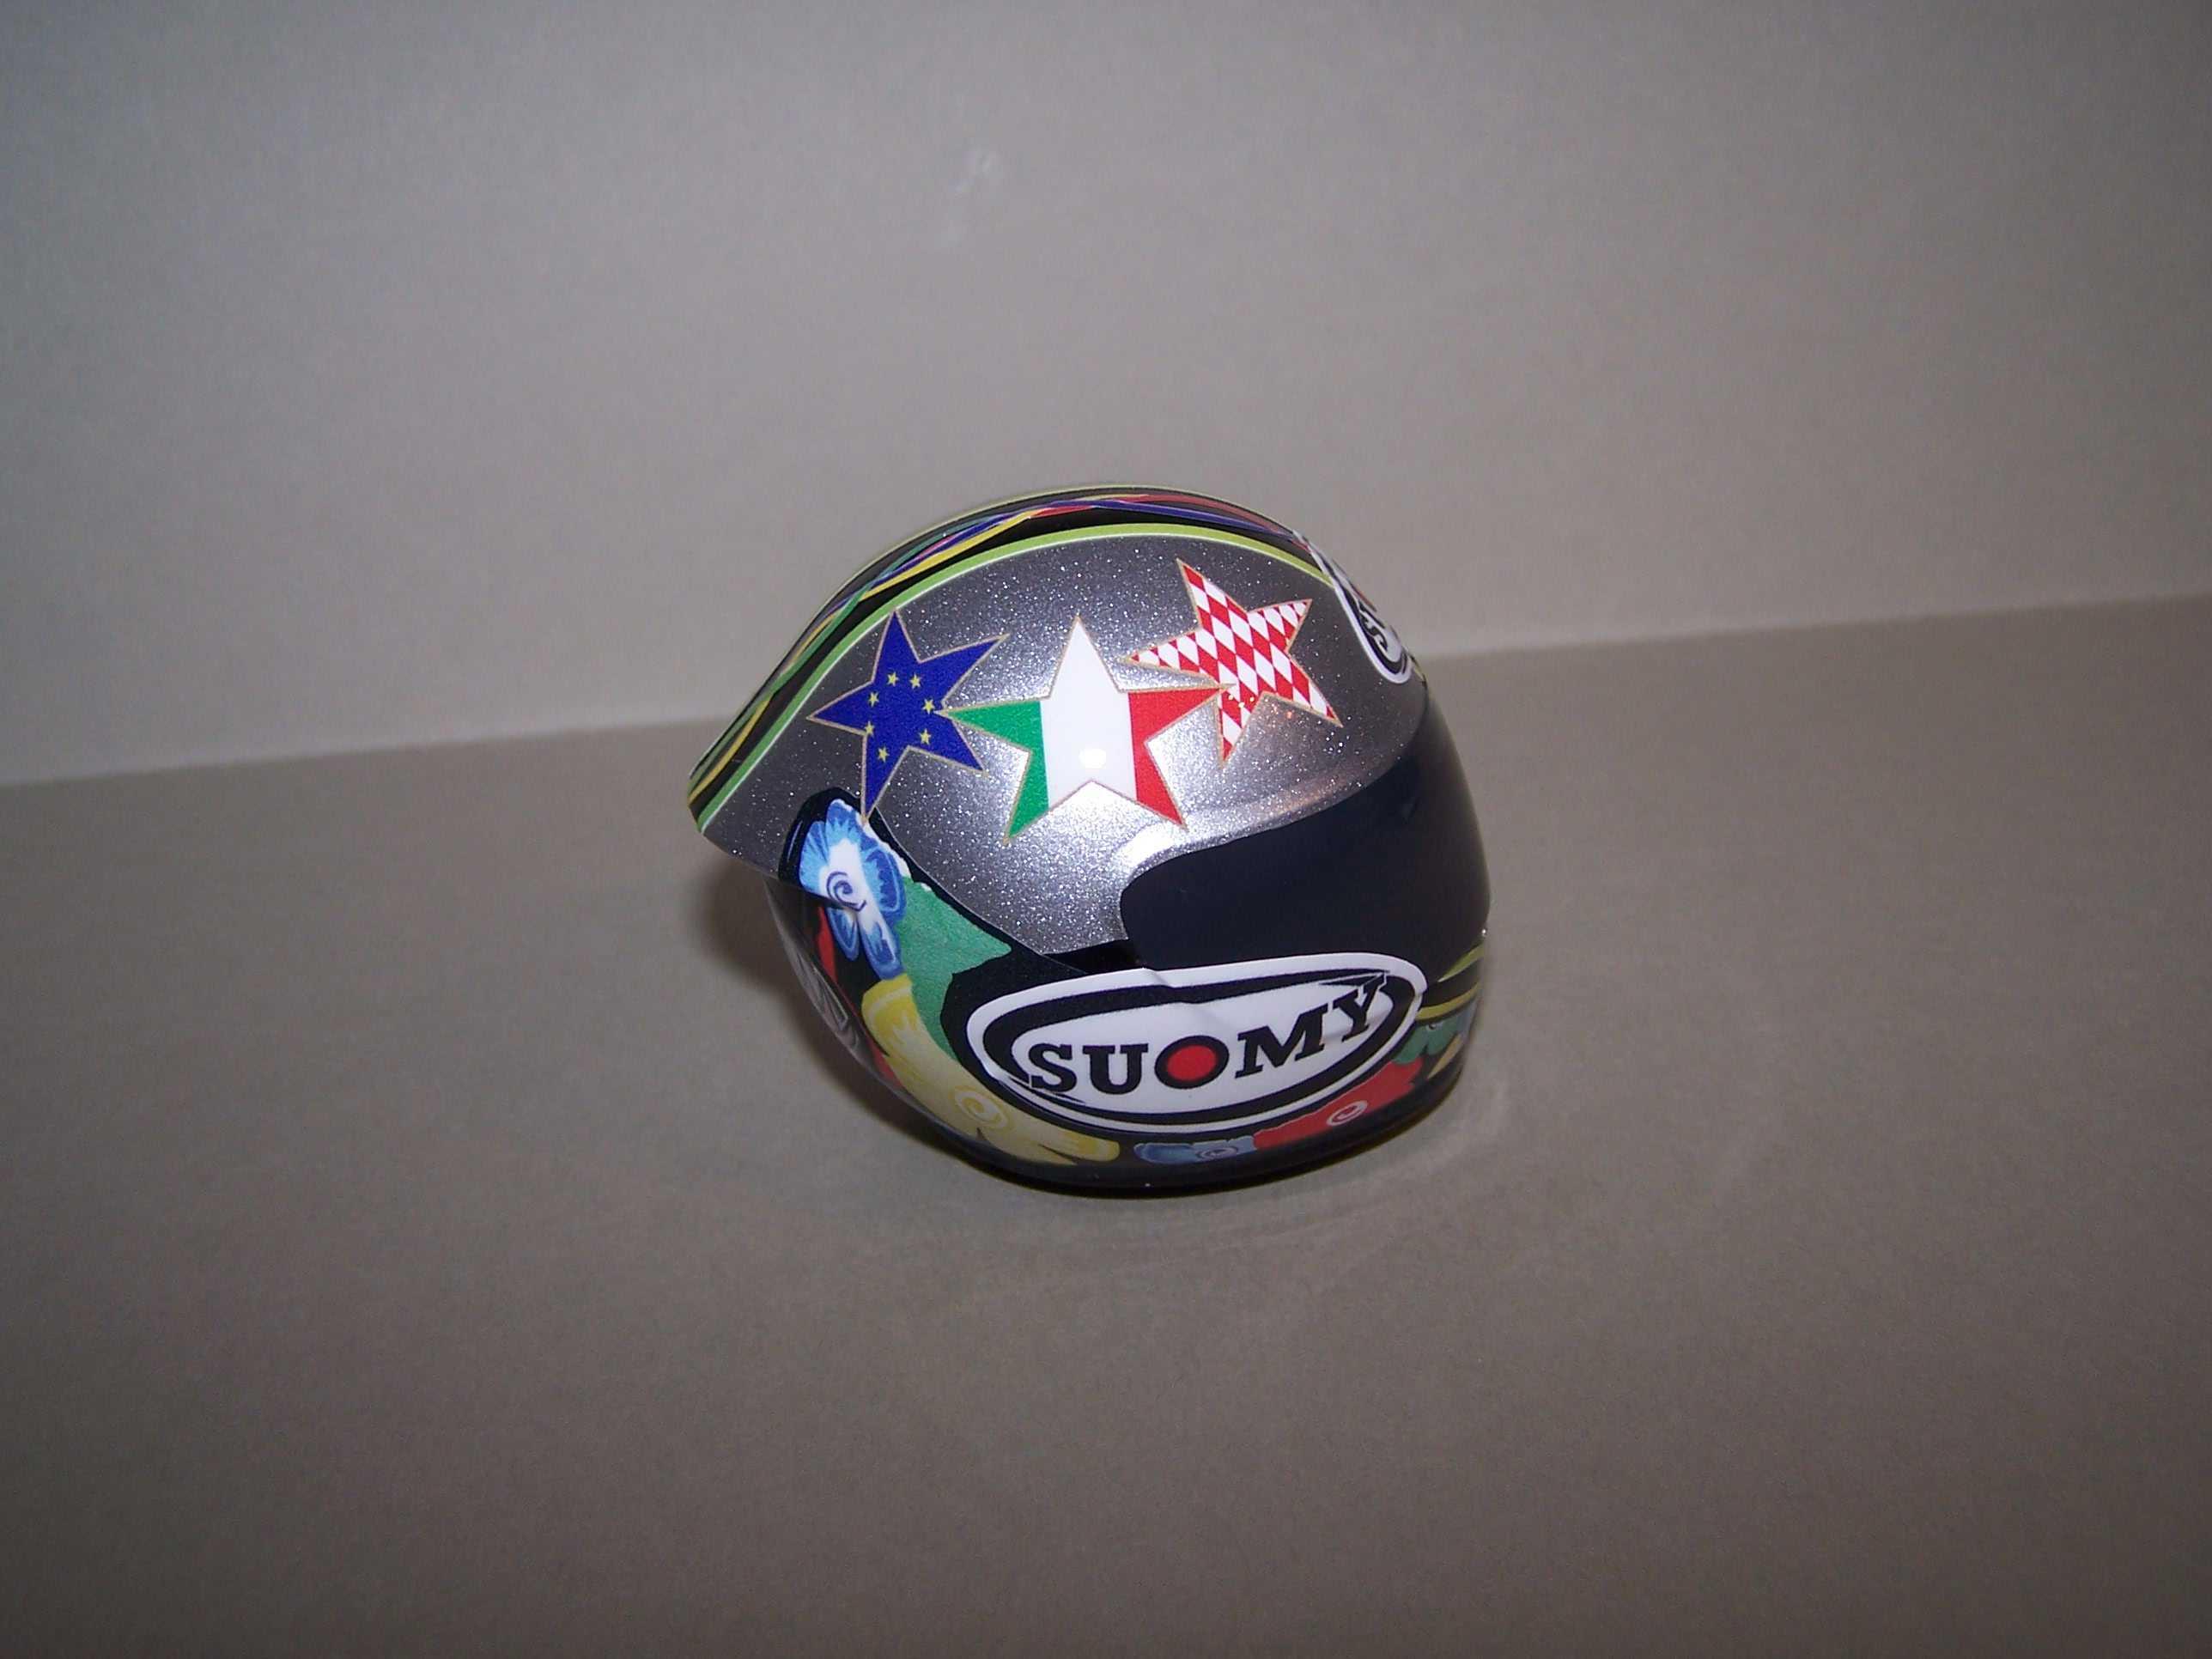 [Helm-Capirossi-Pramac-Ducati-1.jpg]